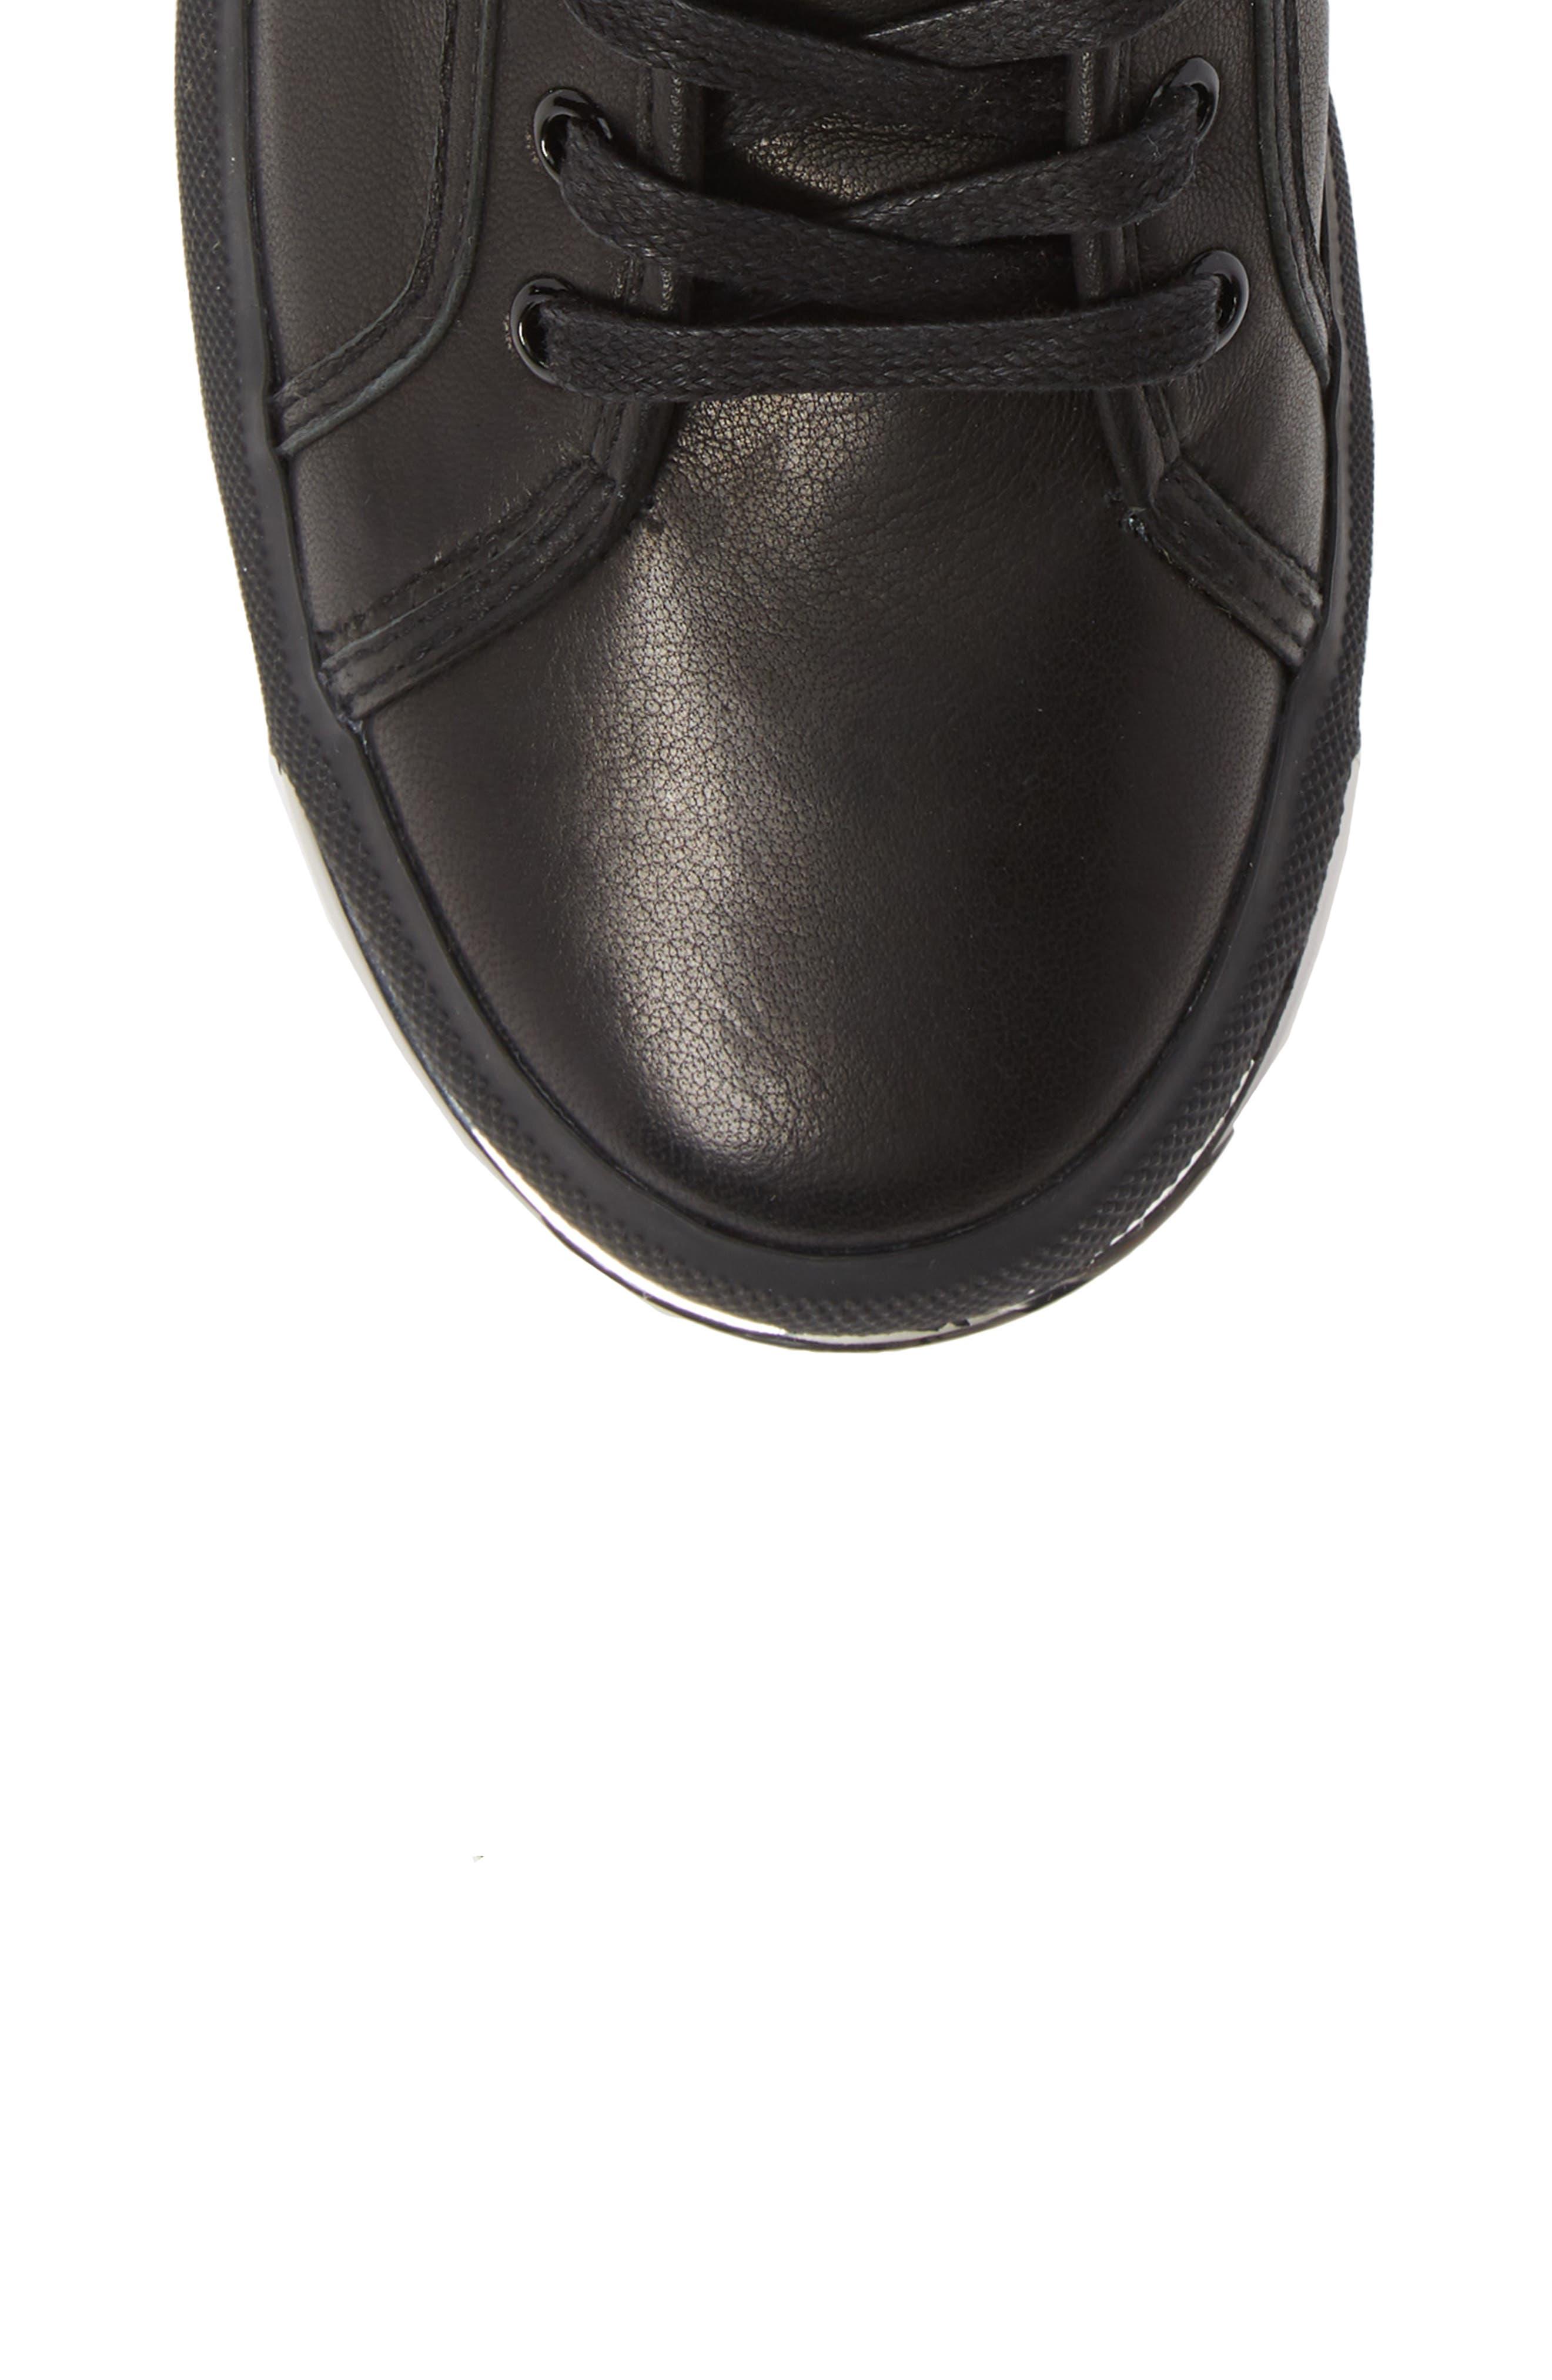 ALEXANDER WANG, Pia High Top Sneaker, Alternate thumbnail 5, color, BLACK